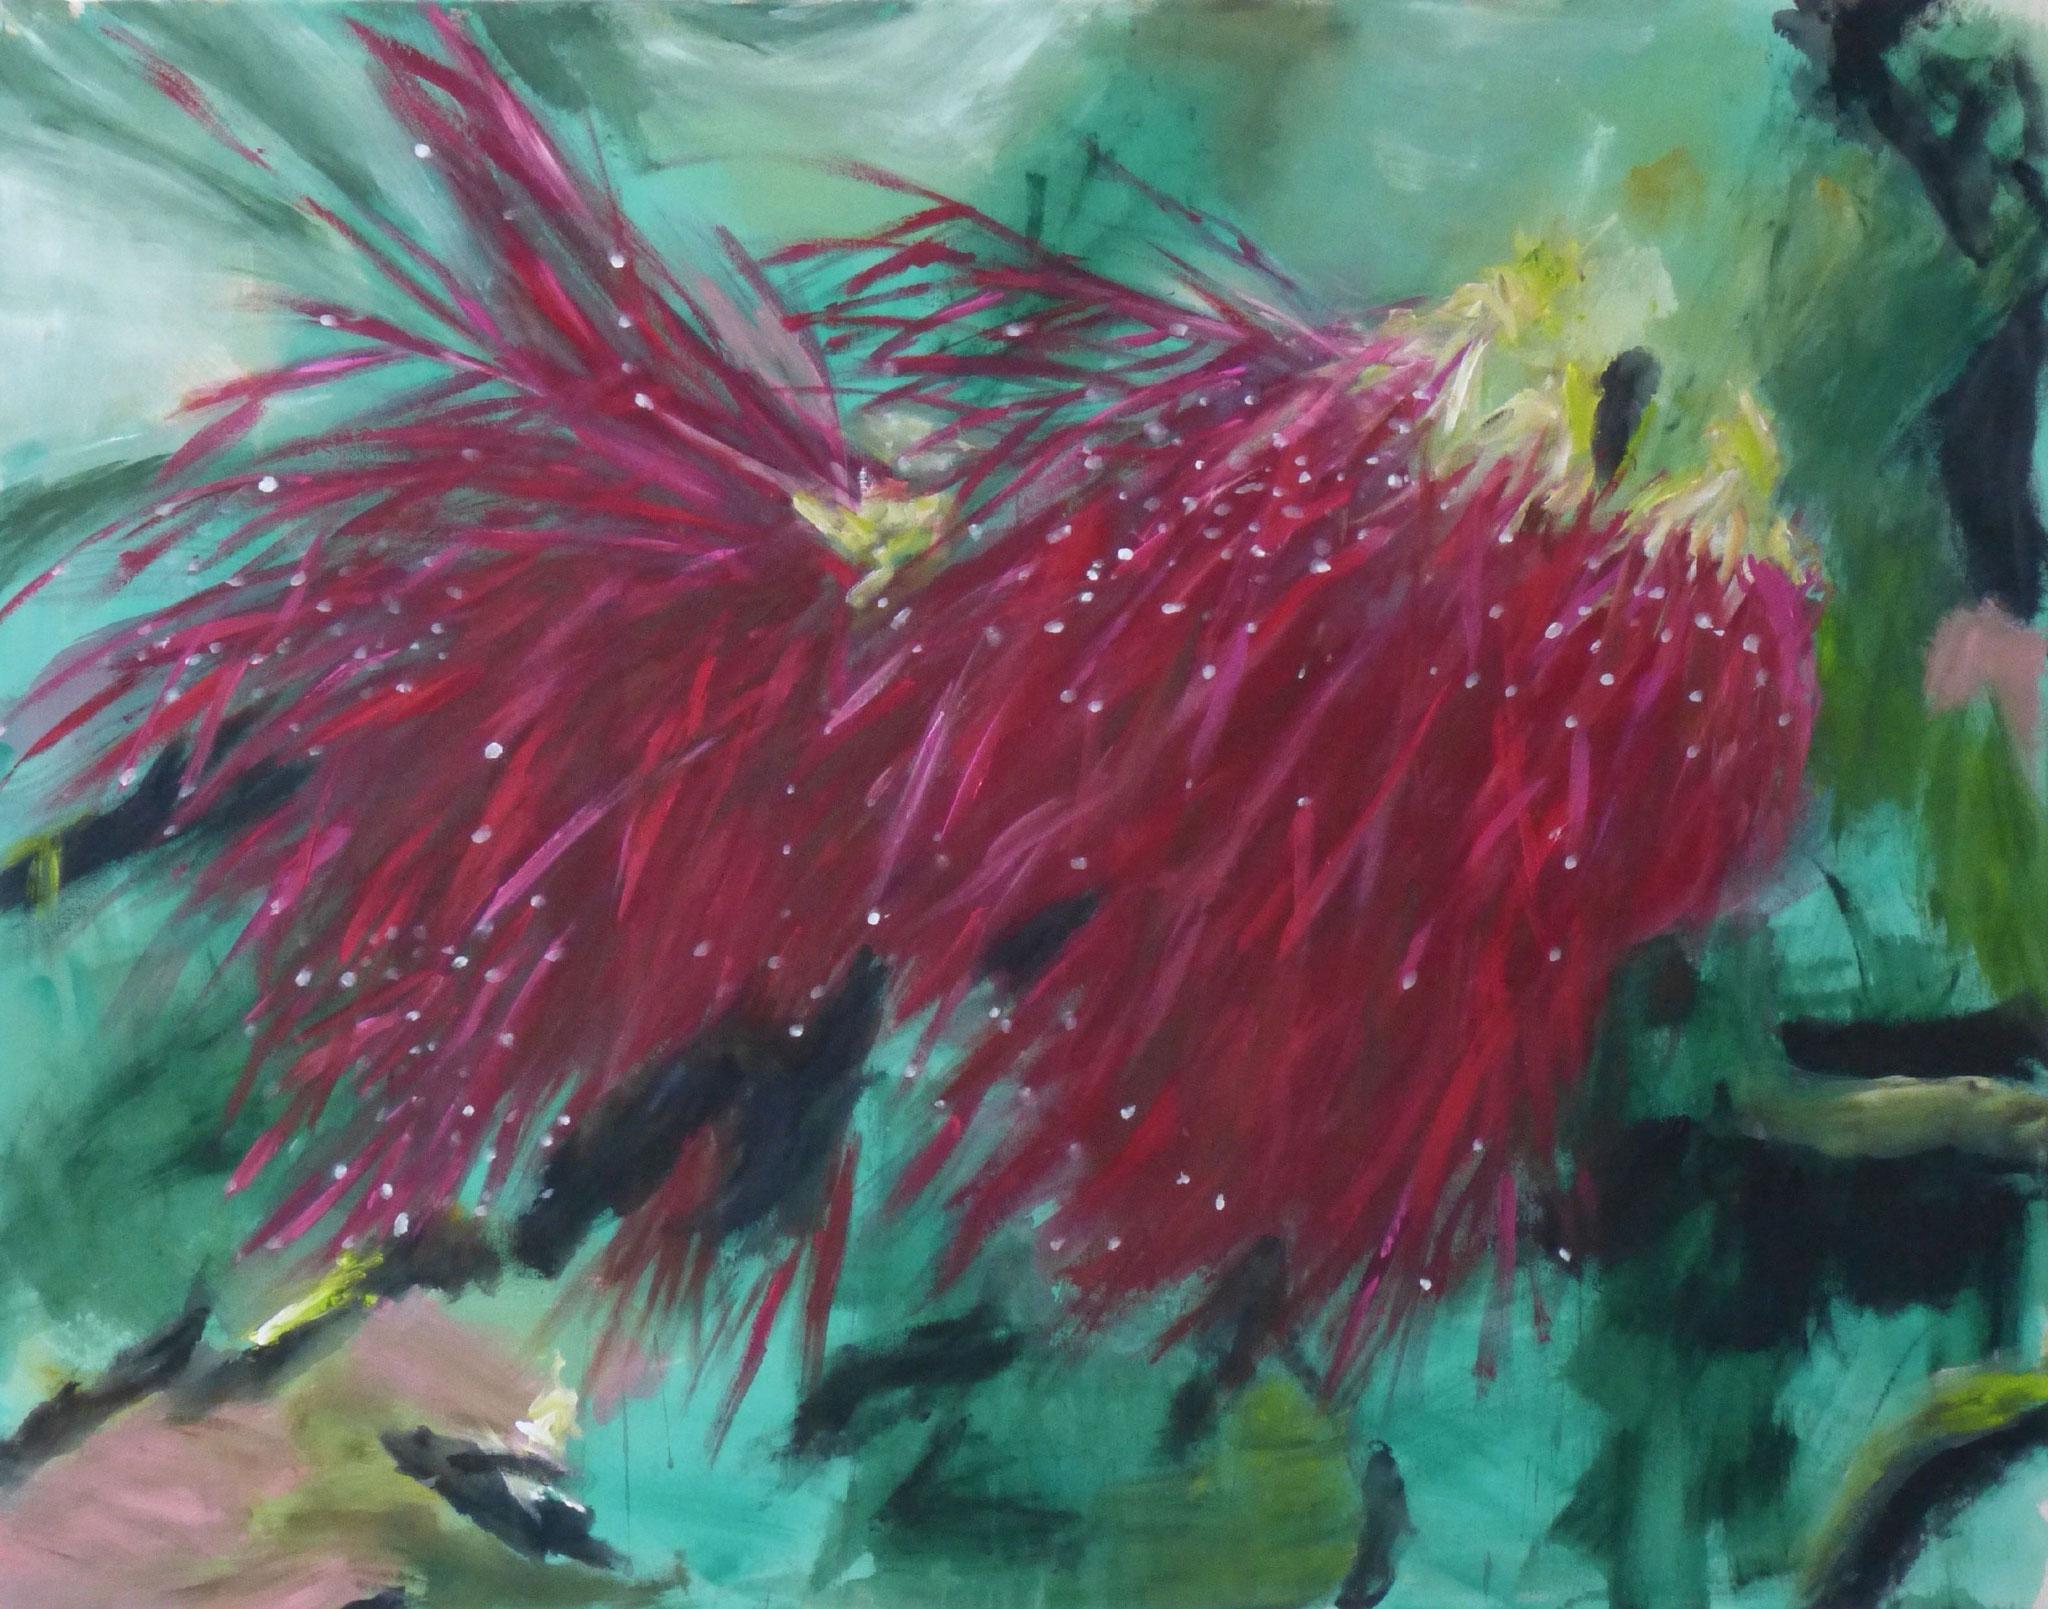 flower poem 1, Acryl/Leinwand, 110x140cm, 2017